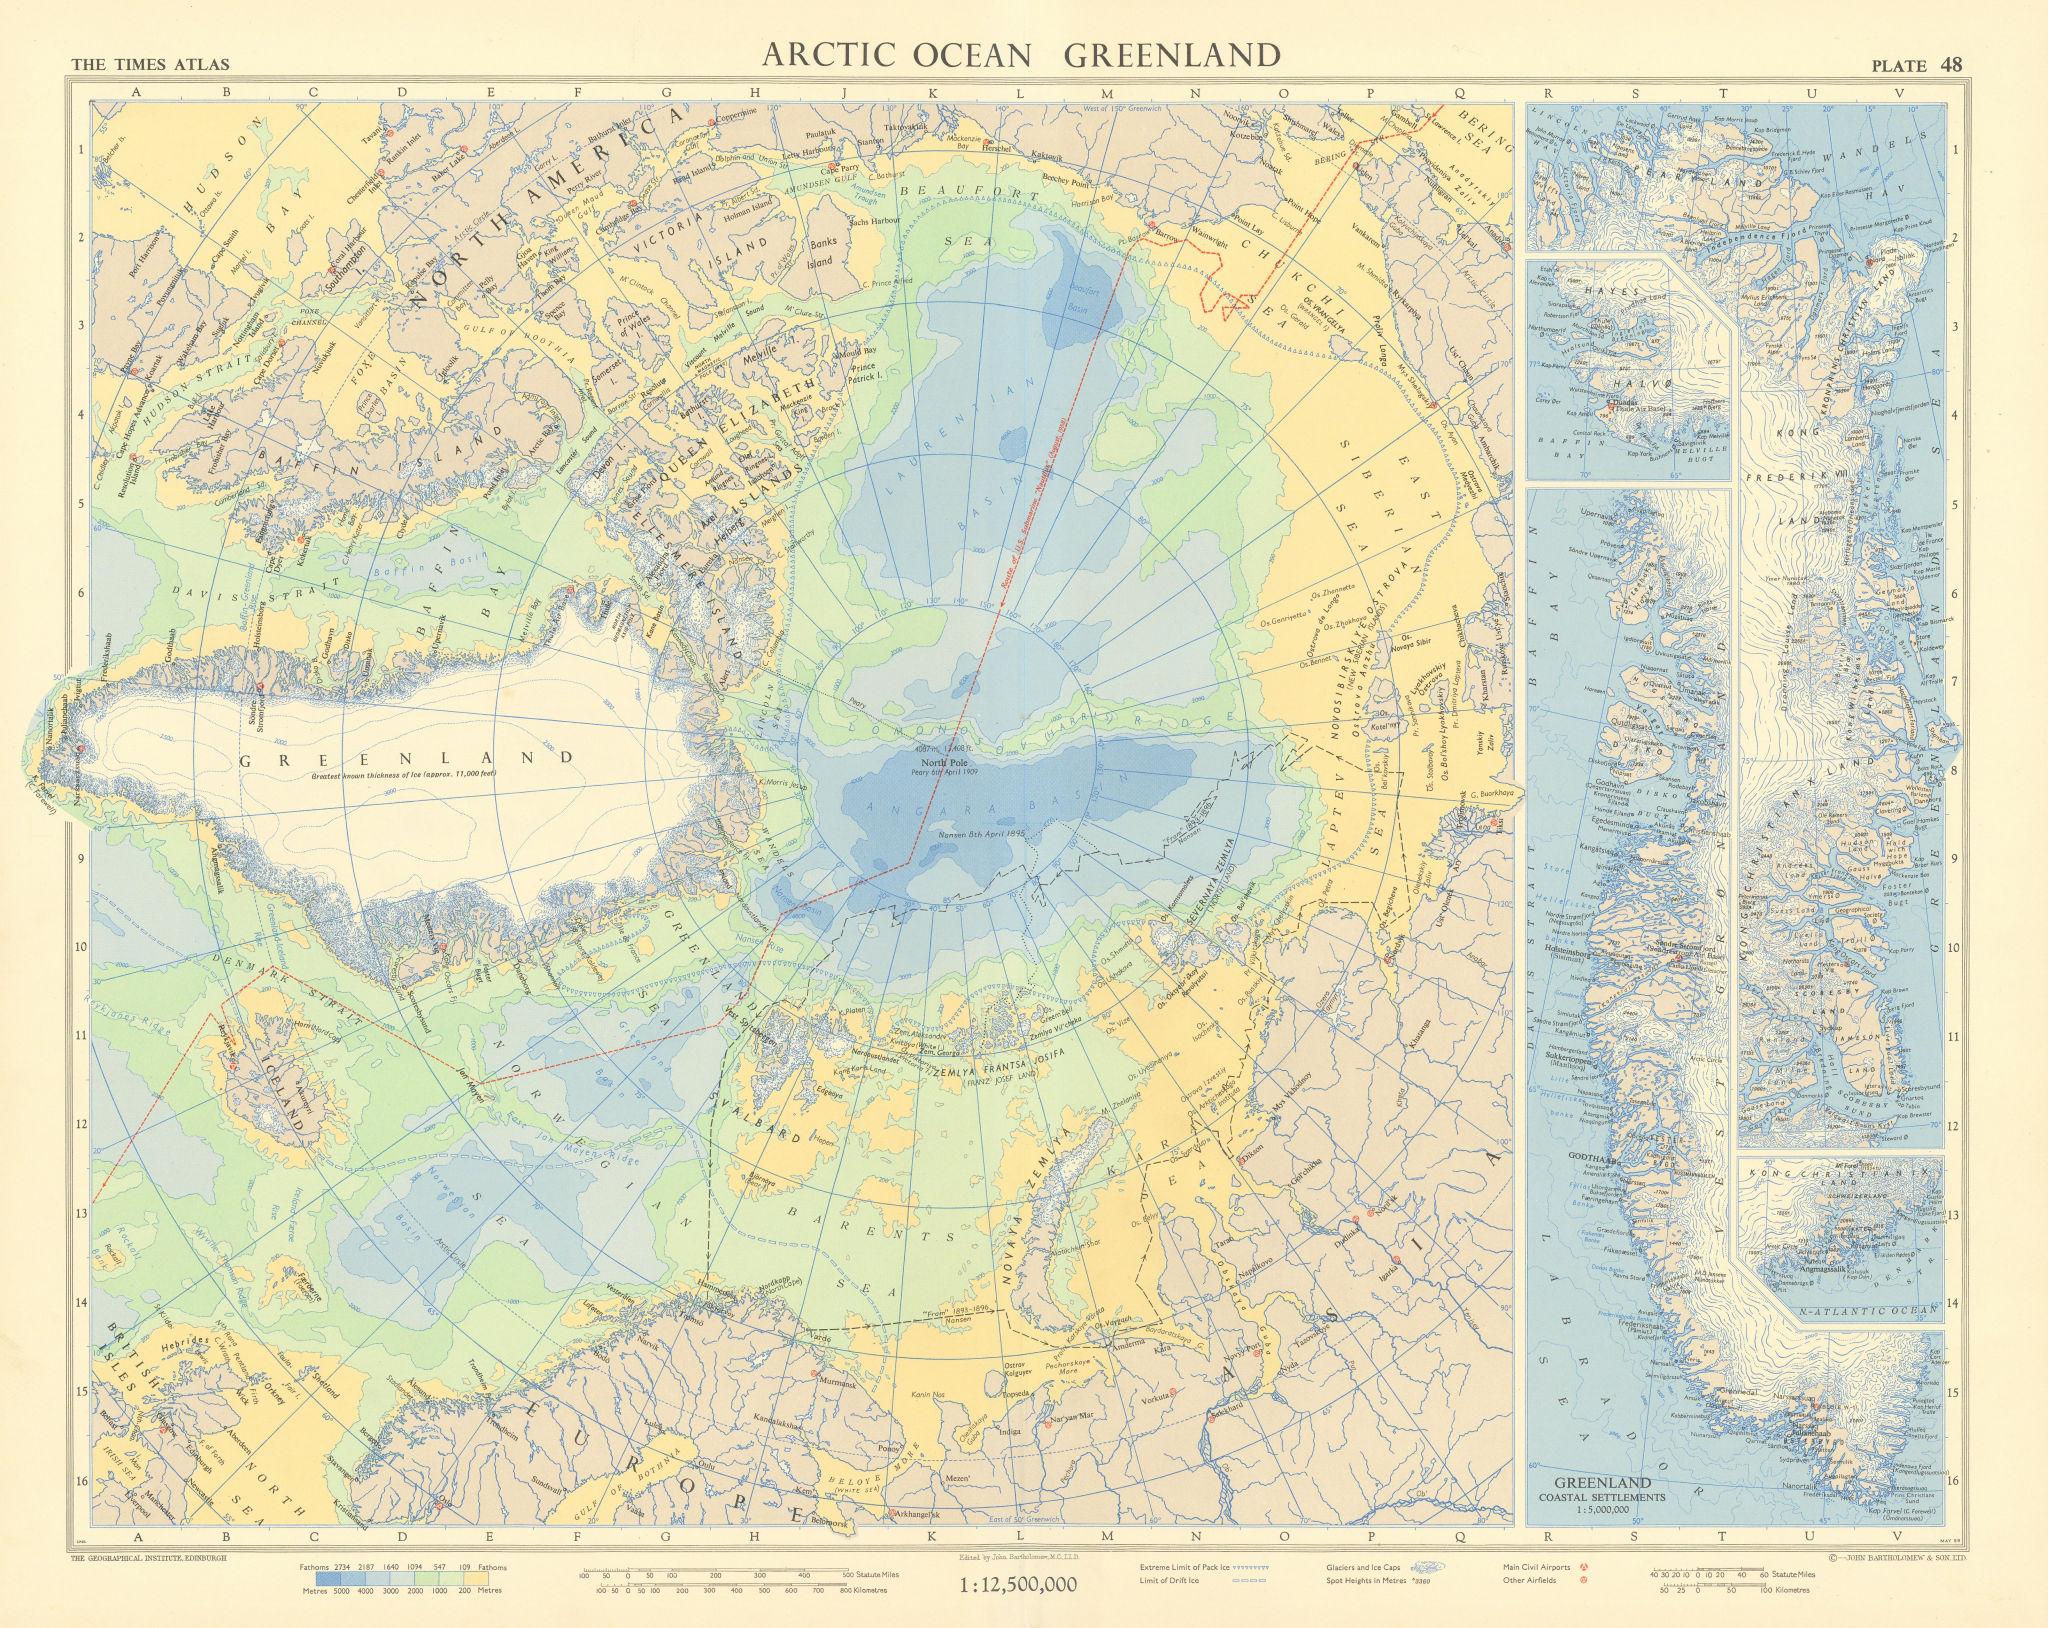 Arctic Ocean. Greenland coastal settlements. Nautilus route. TIMES 1959 map